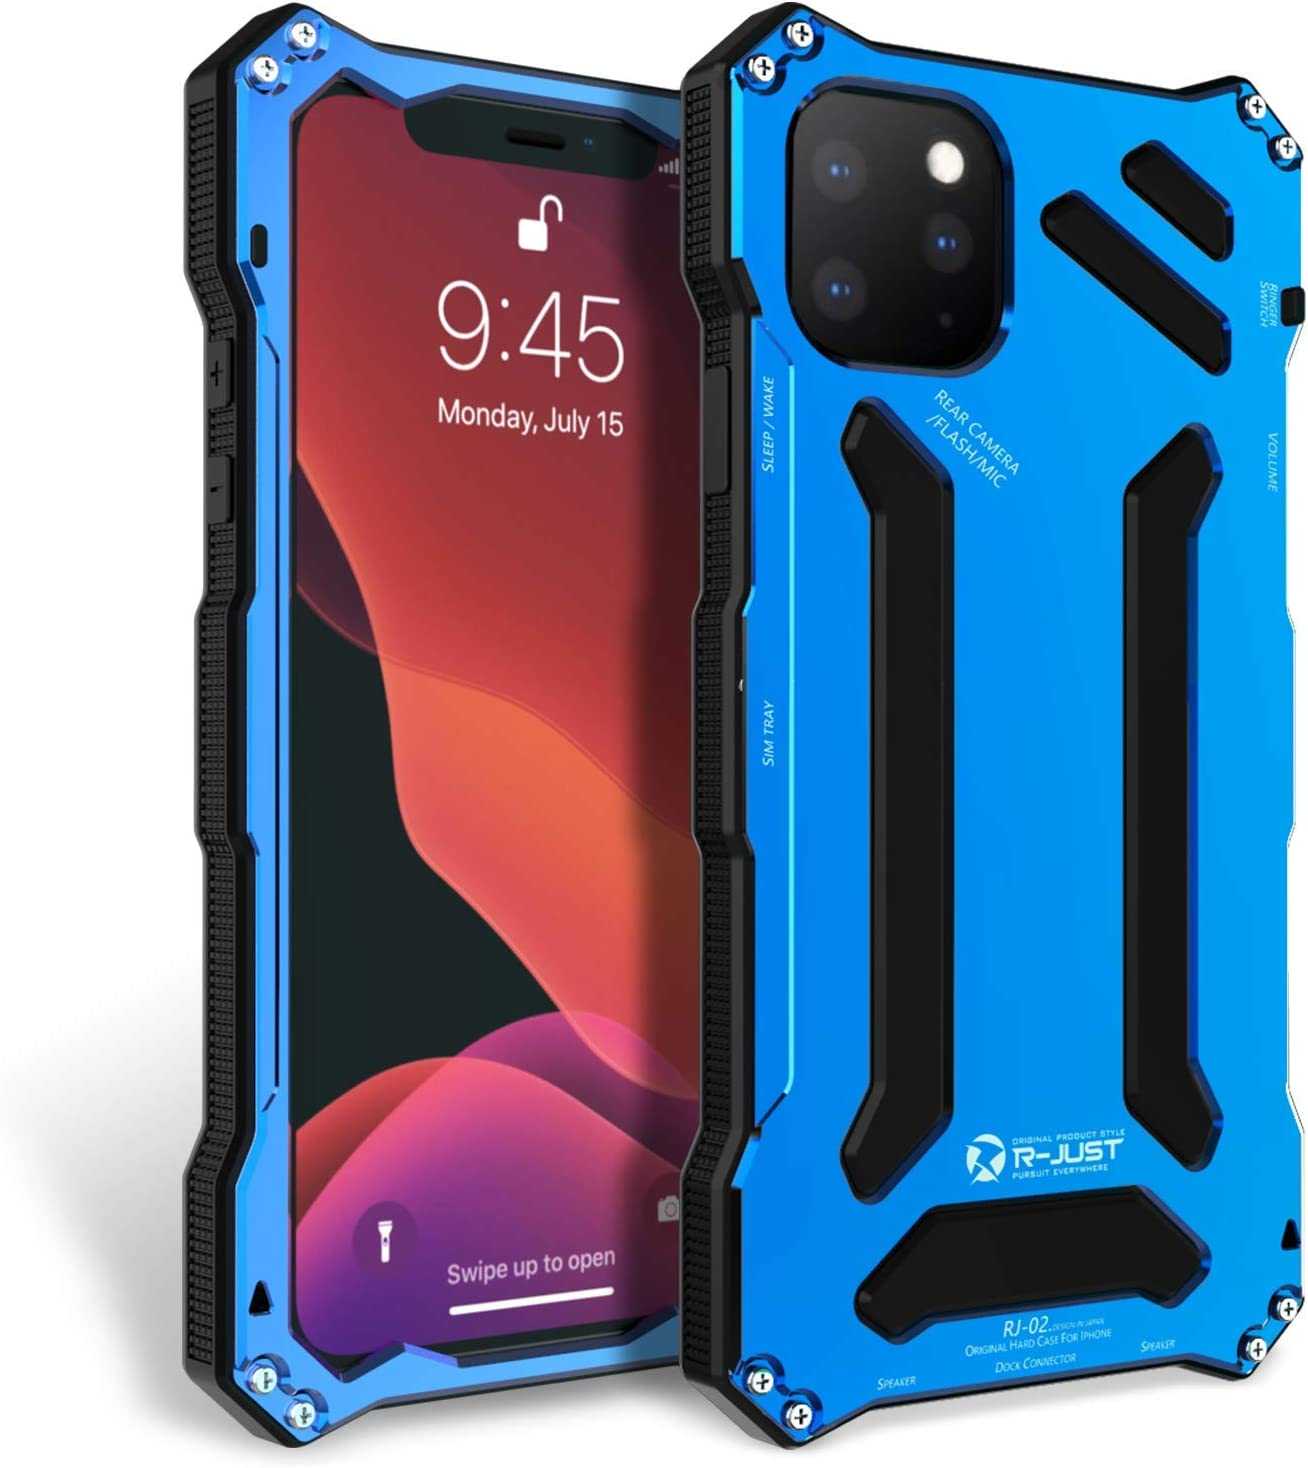 Amazon Com Bpowe Iphone 11 Pro Max Case Gundam Aluminum Metal Premium Protection Hard Shockproof Military Bumper Heavy Duty Sturdy Protective Cover Case For Iphone 11 Pro Max Blue Iphone 11 Pro Max 6 5